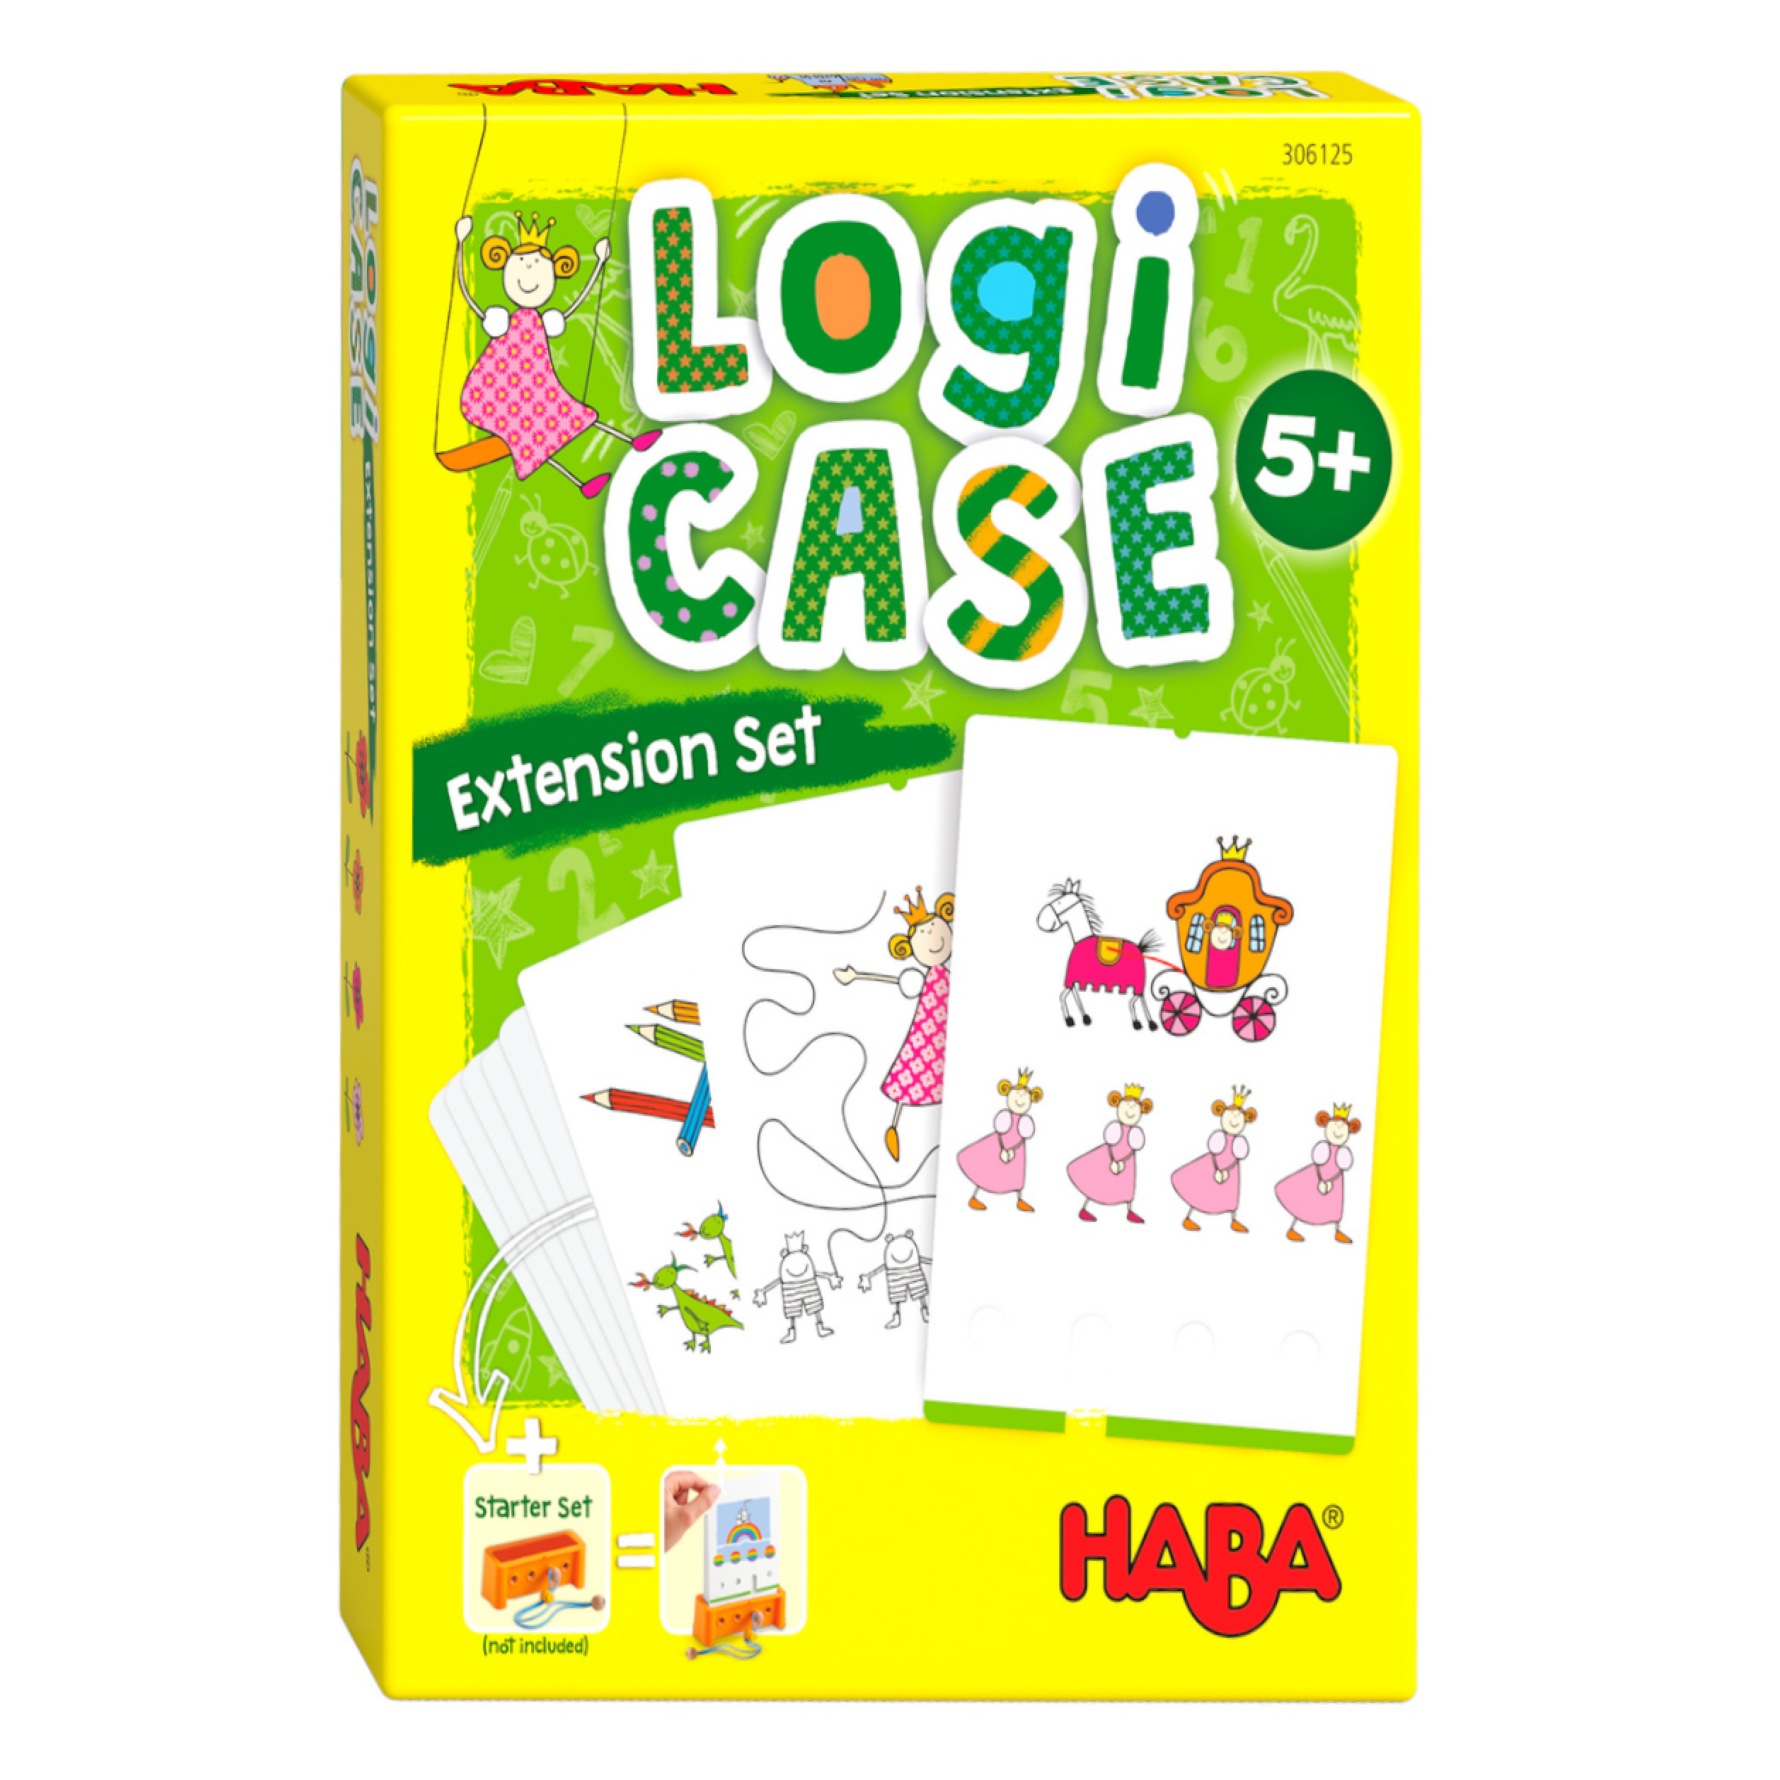 Spel - LogiCASE - Prinsessen - Uitbreidingsset - 5+